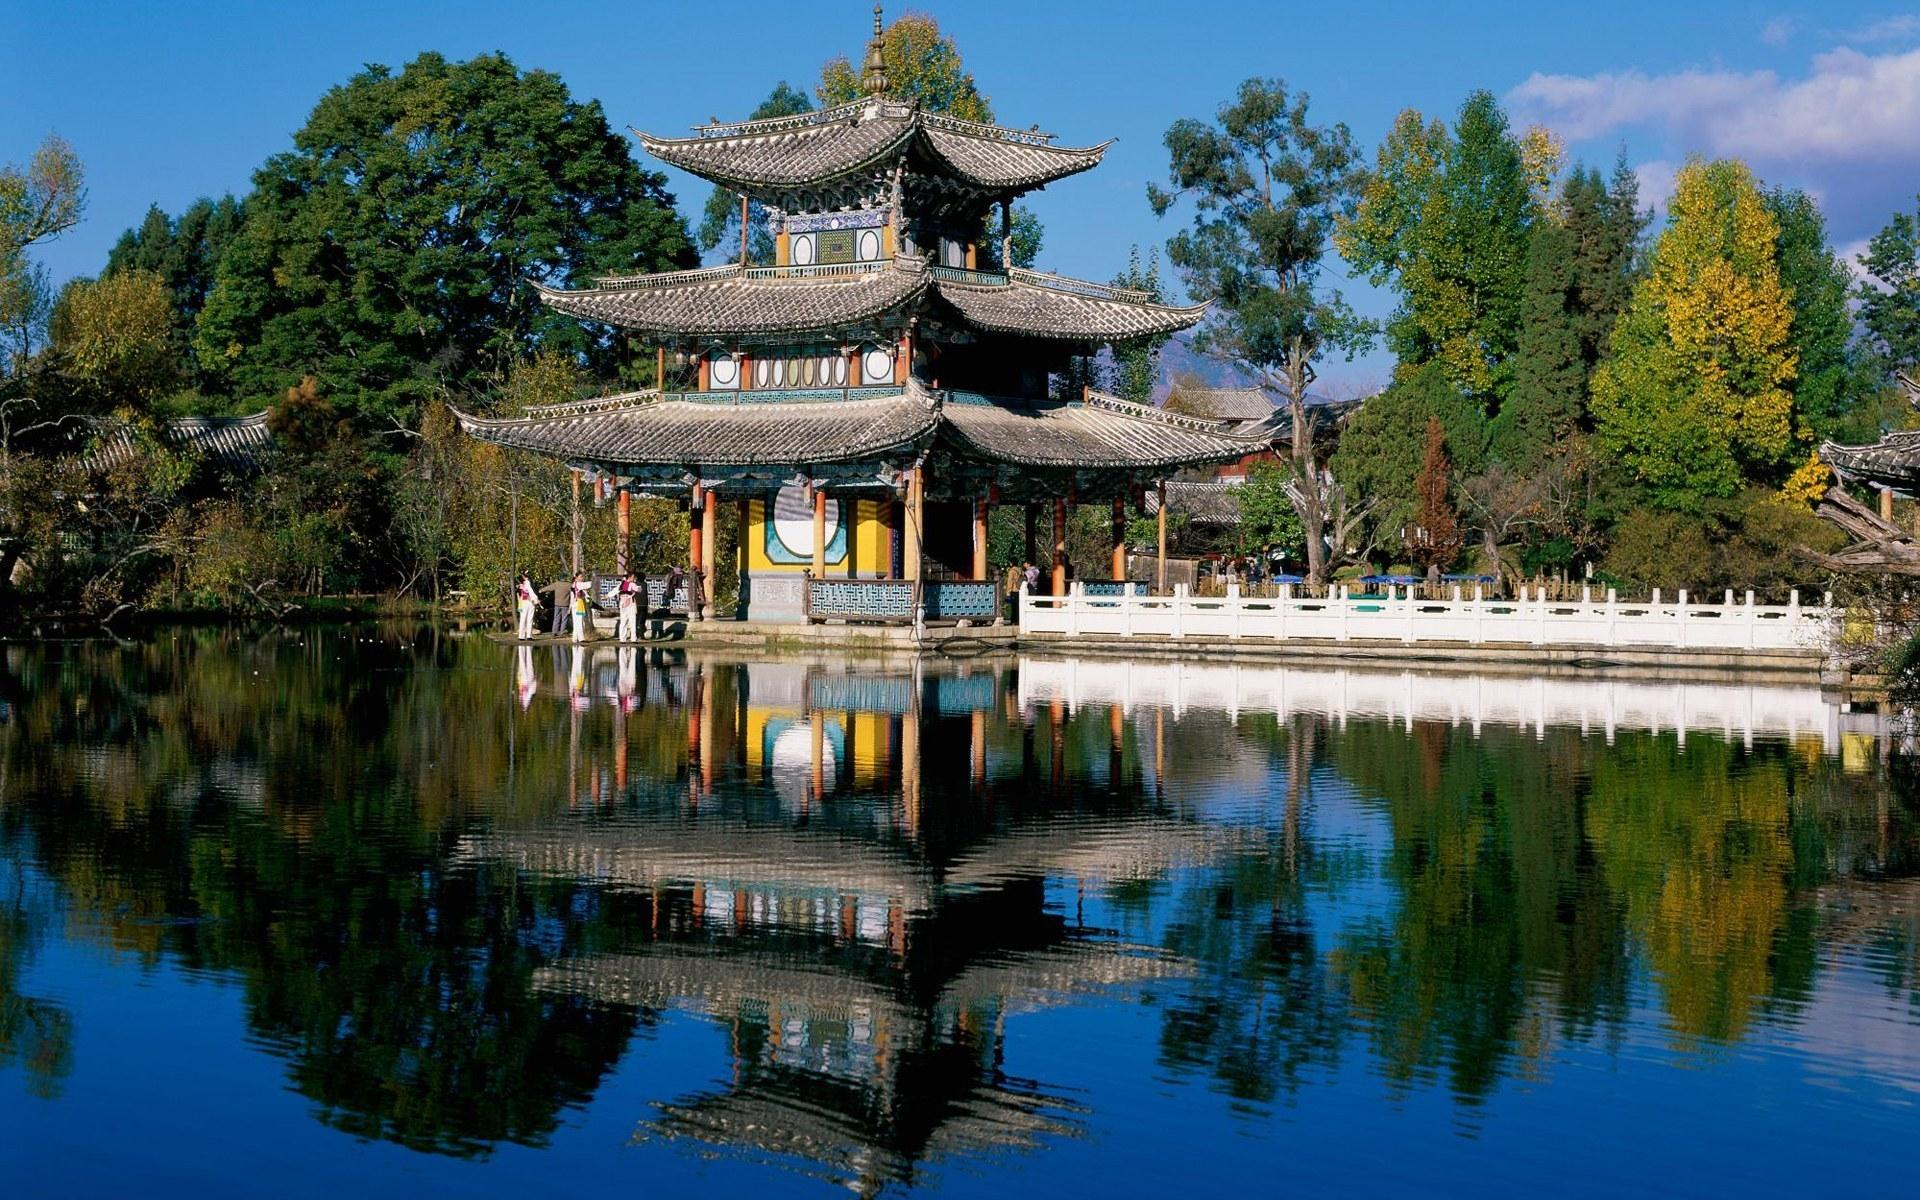 chinesischer garten wallpaper – motelindio, Garten ideen